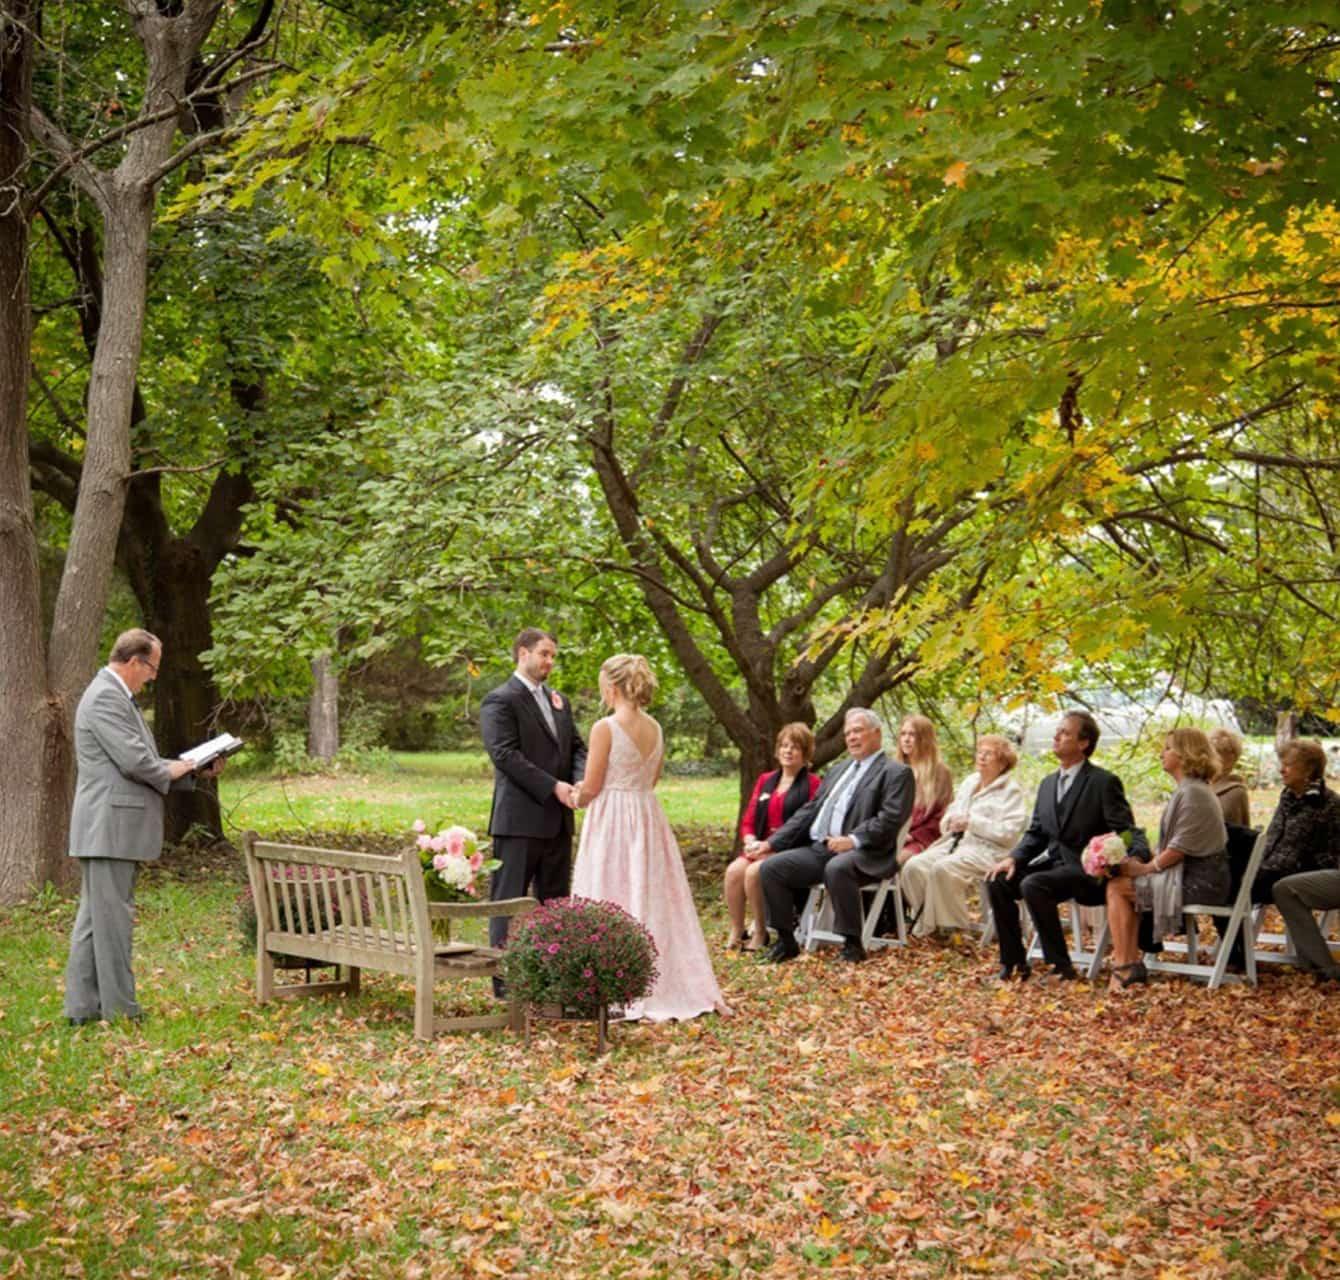 Wedding ceremony at Brampton Bed & Breakfast Inn